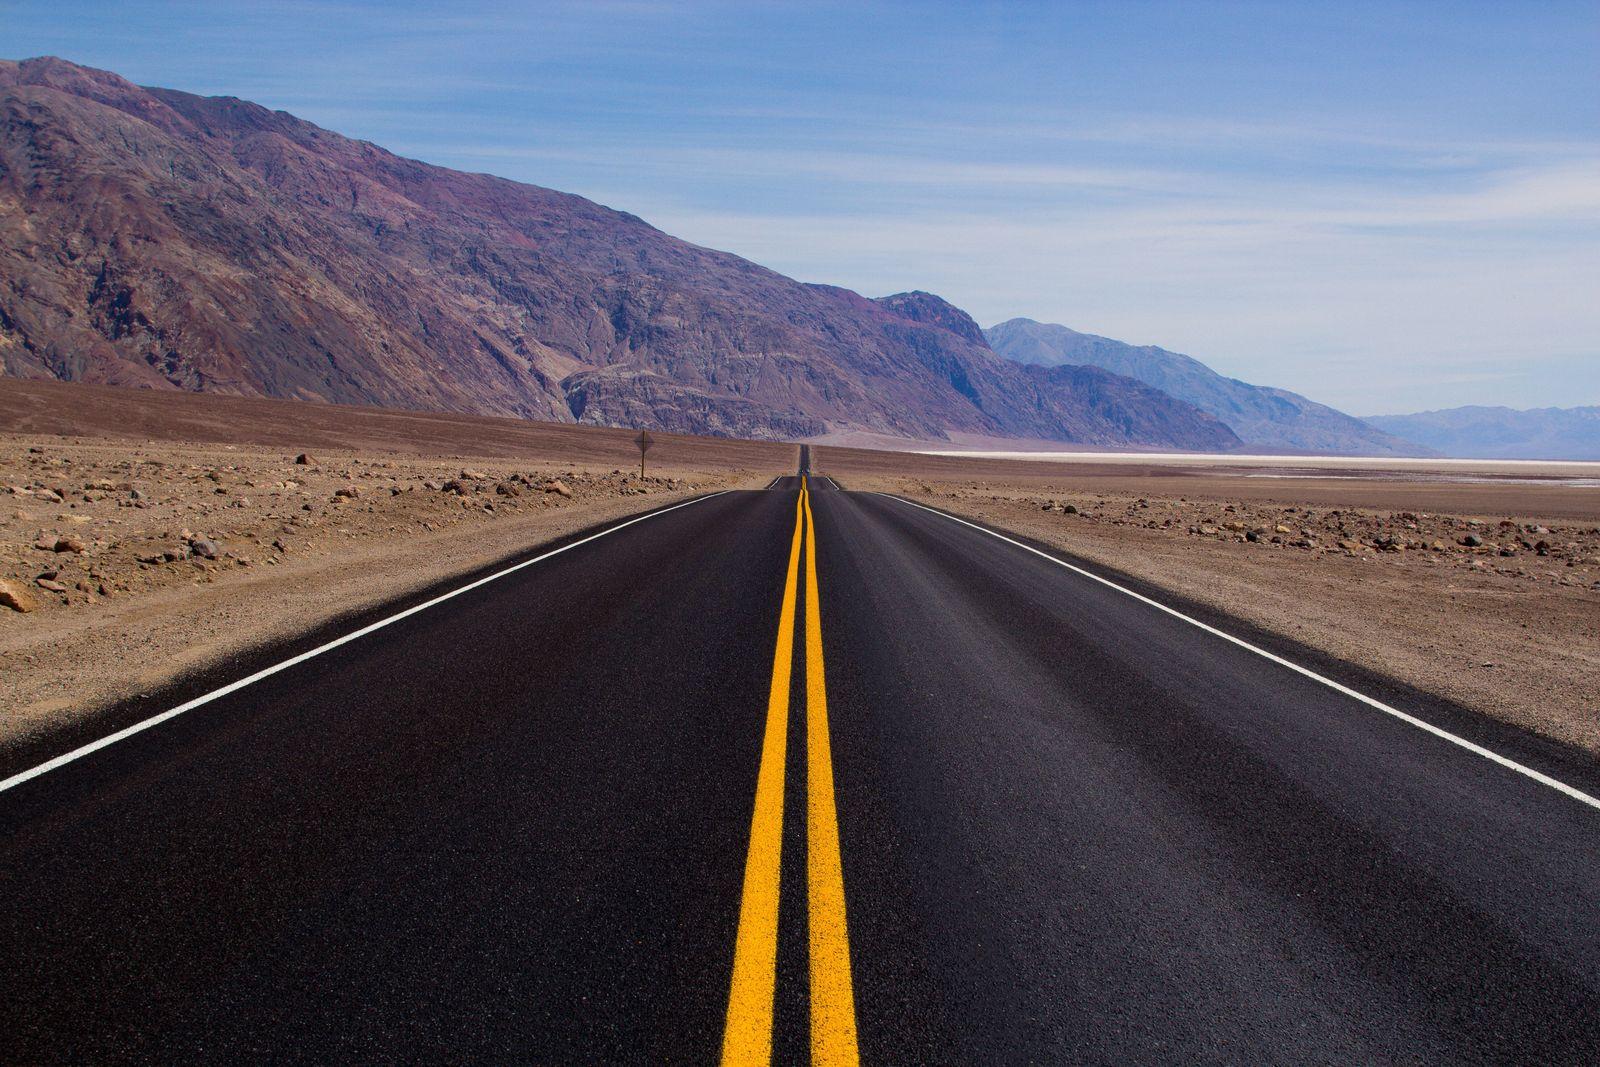 Road through Death Valley adventure, america, California, death valley, desert, hike, hiking, holiday, hot, Journey, la